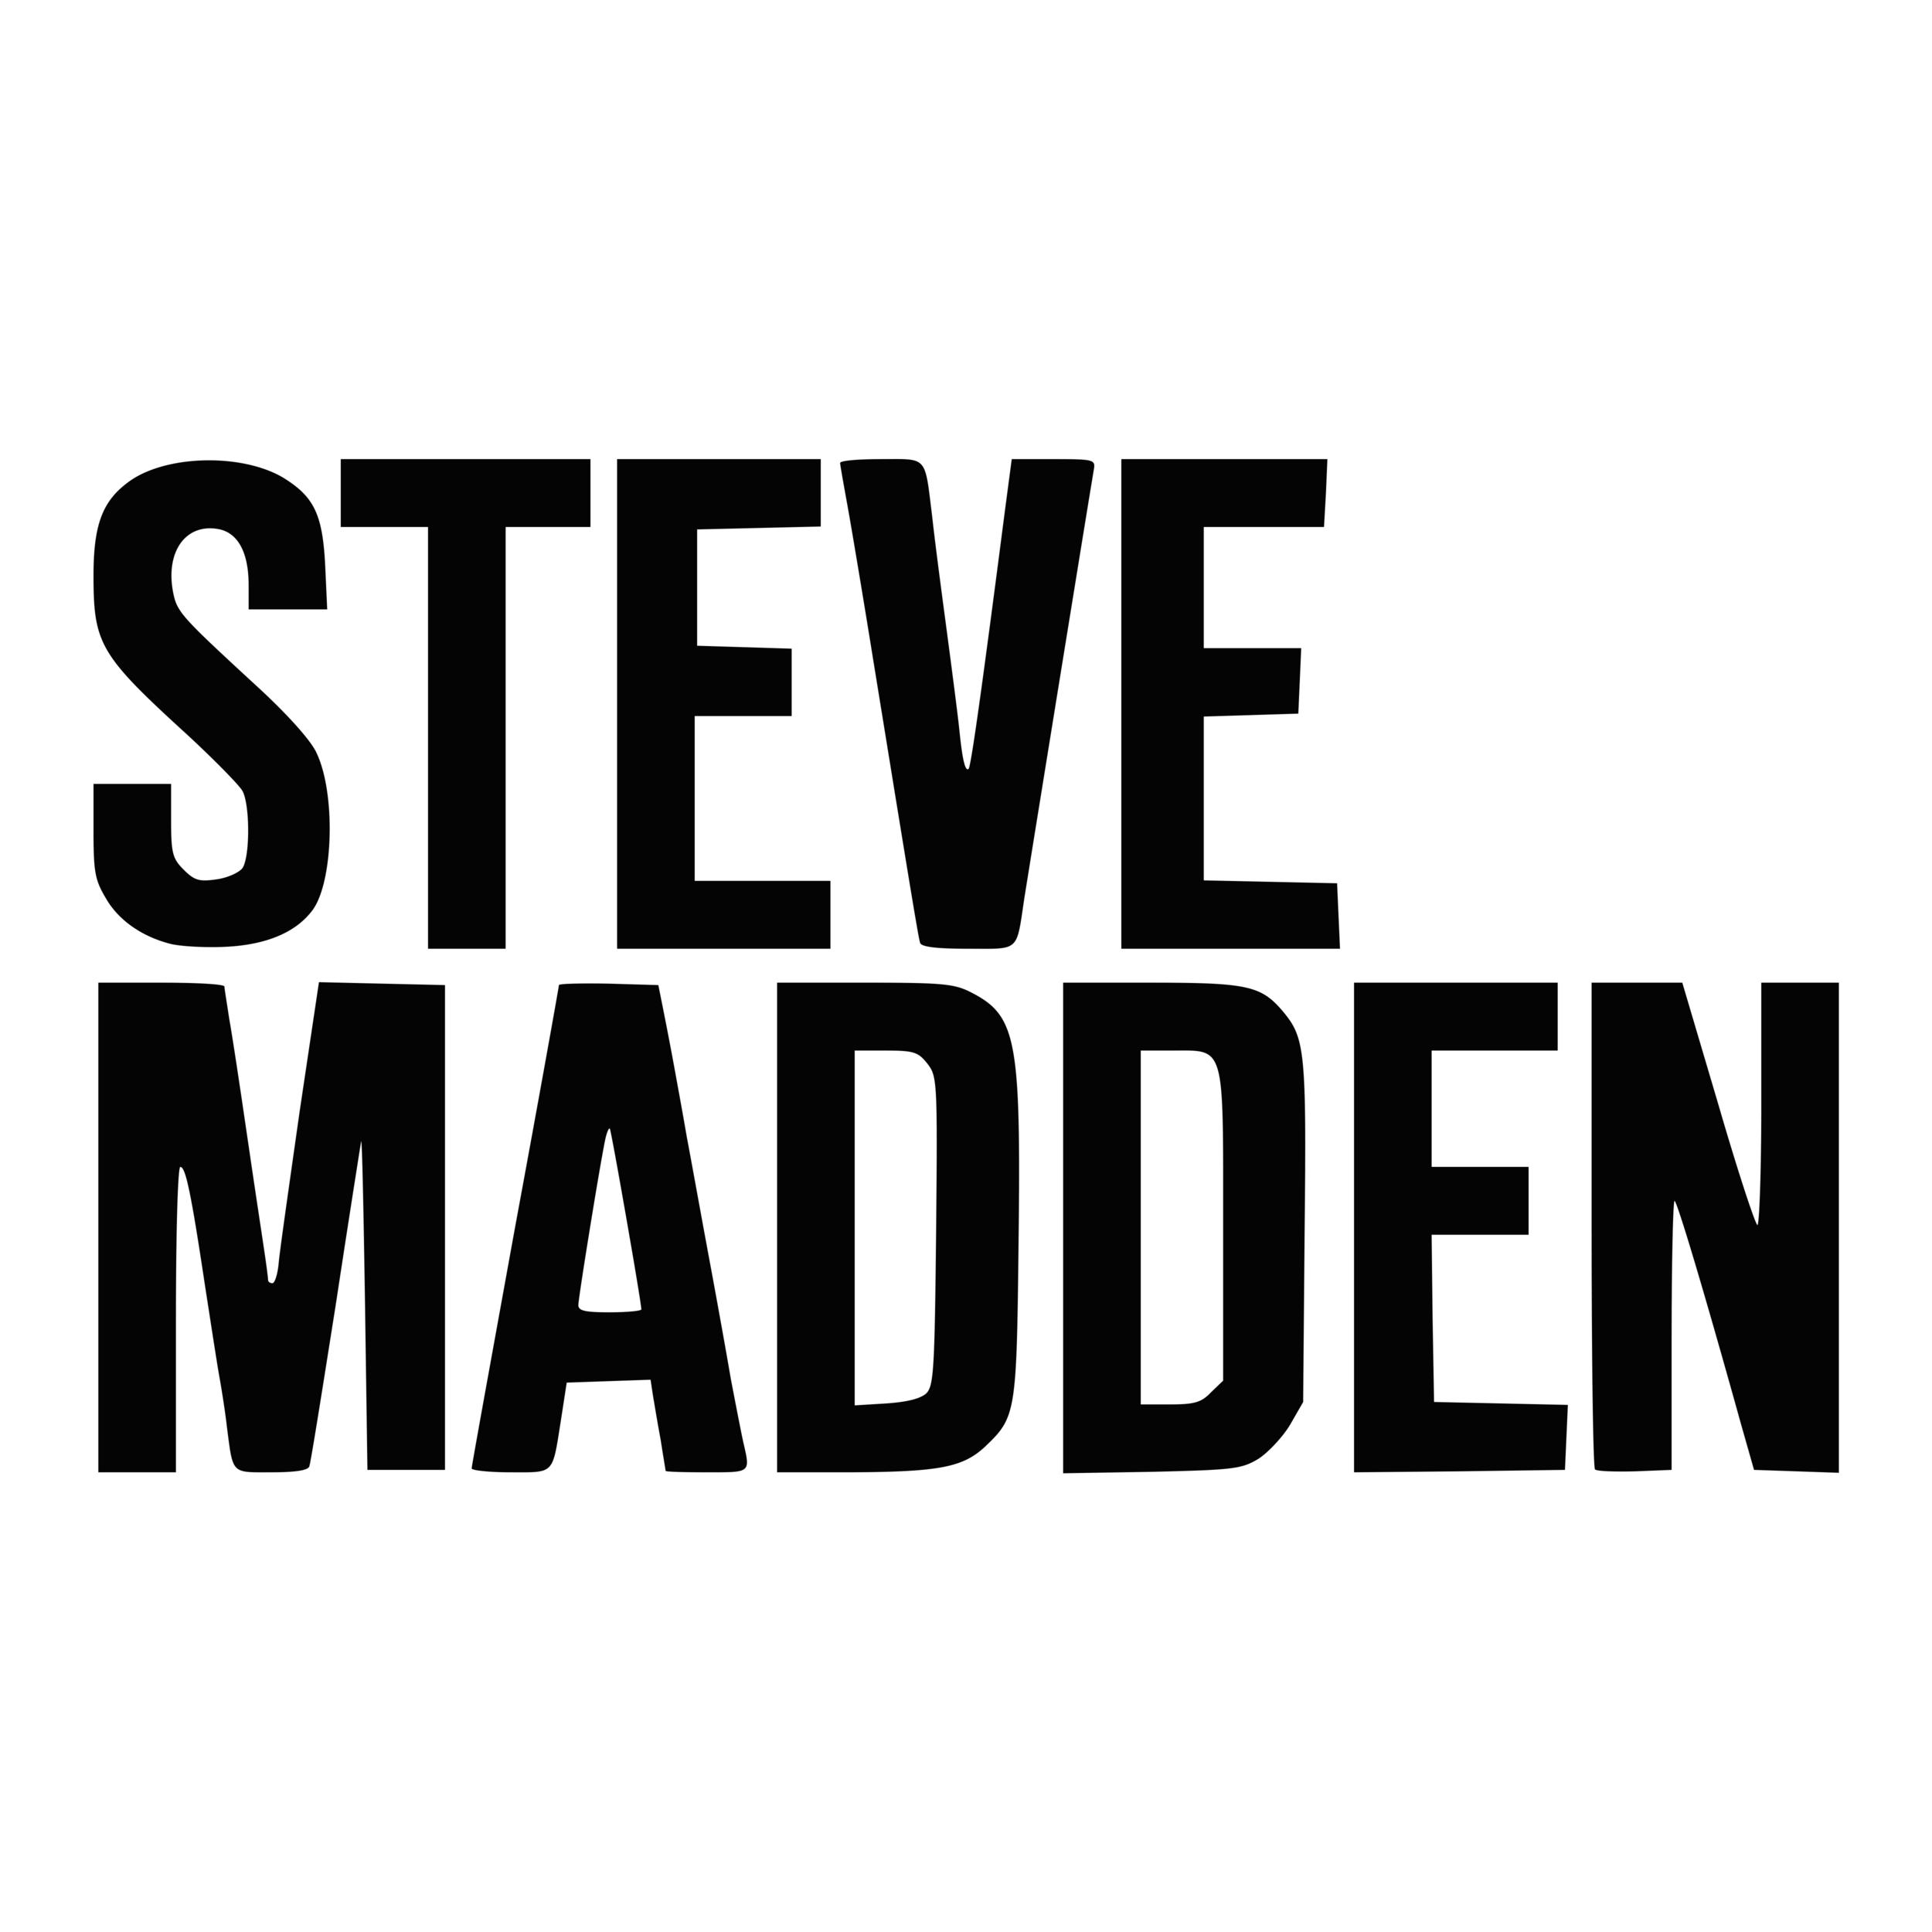 Steve Madden.png